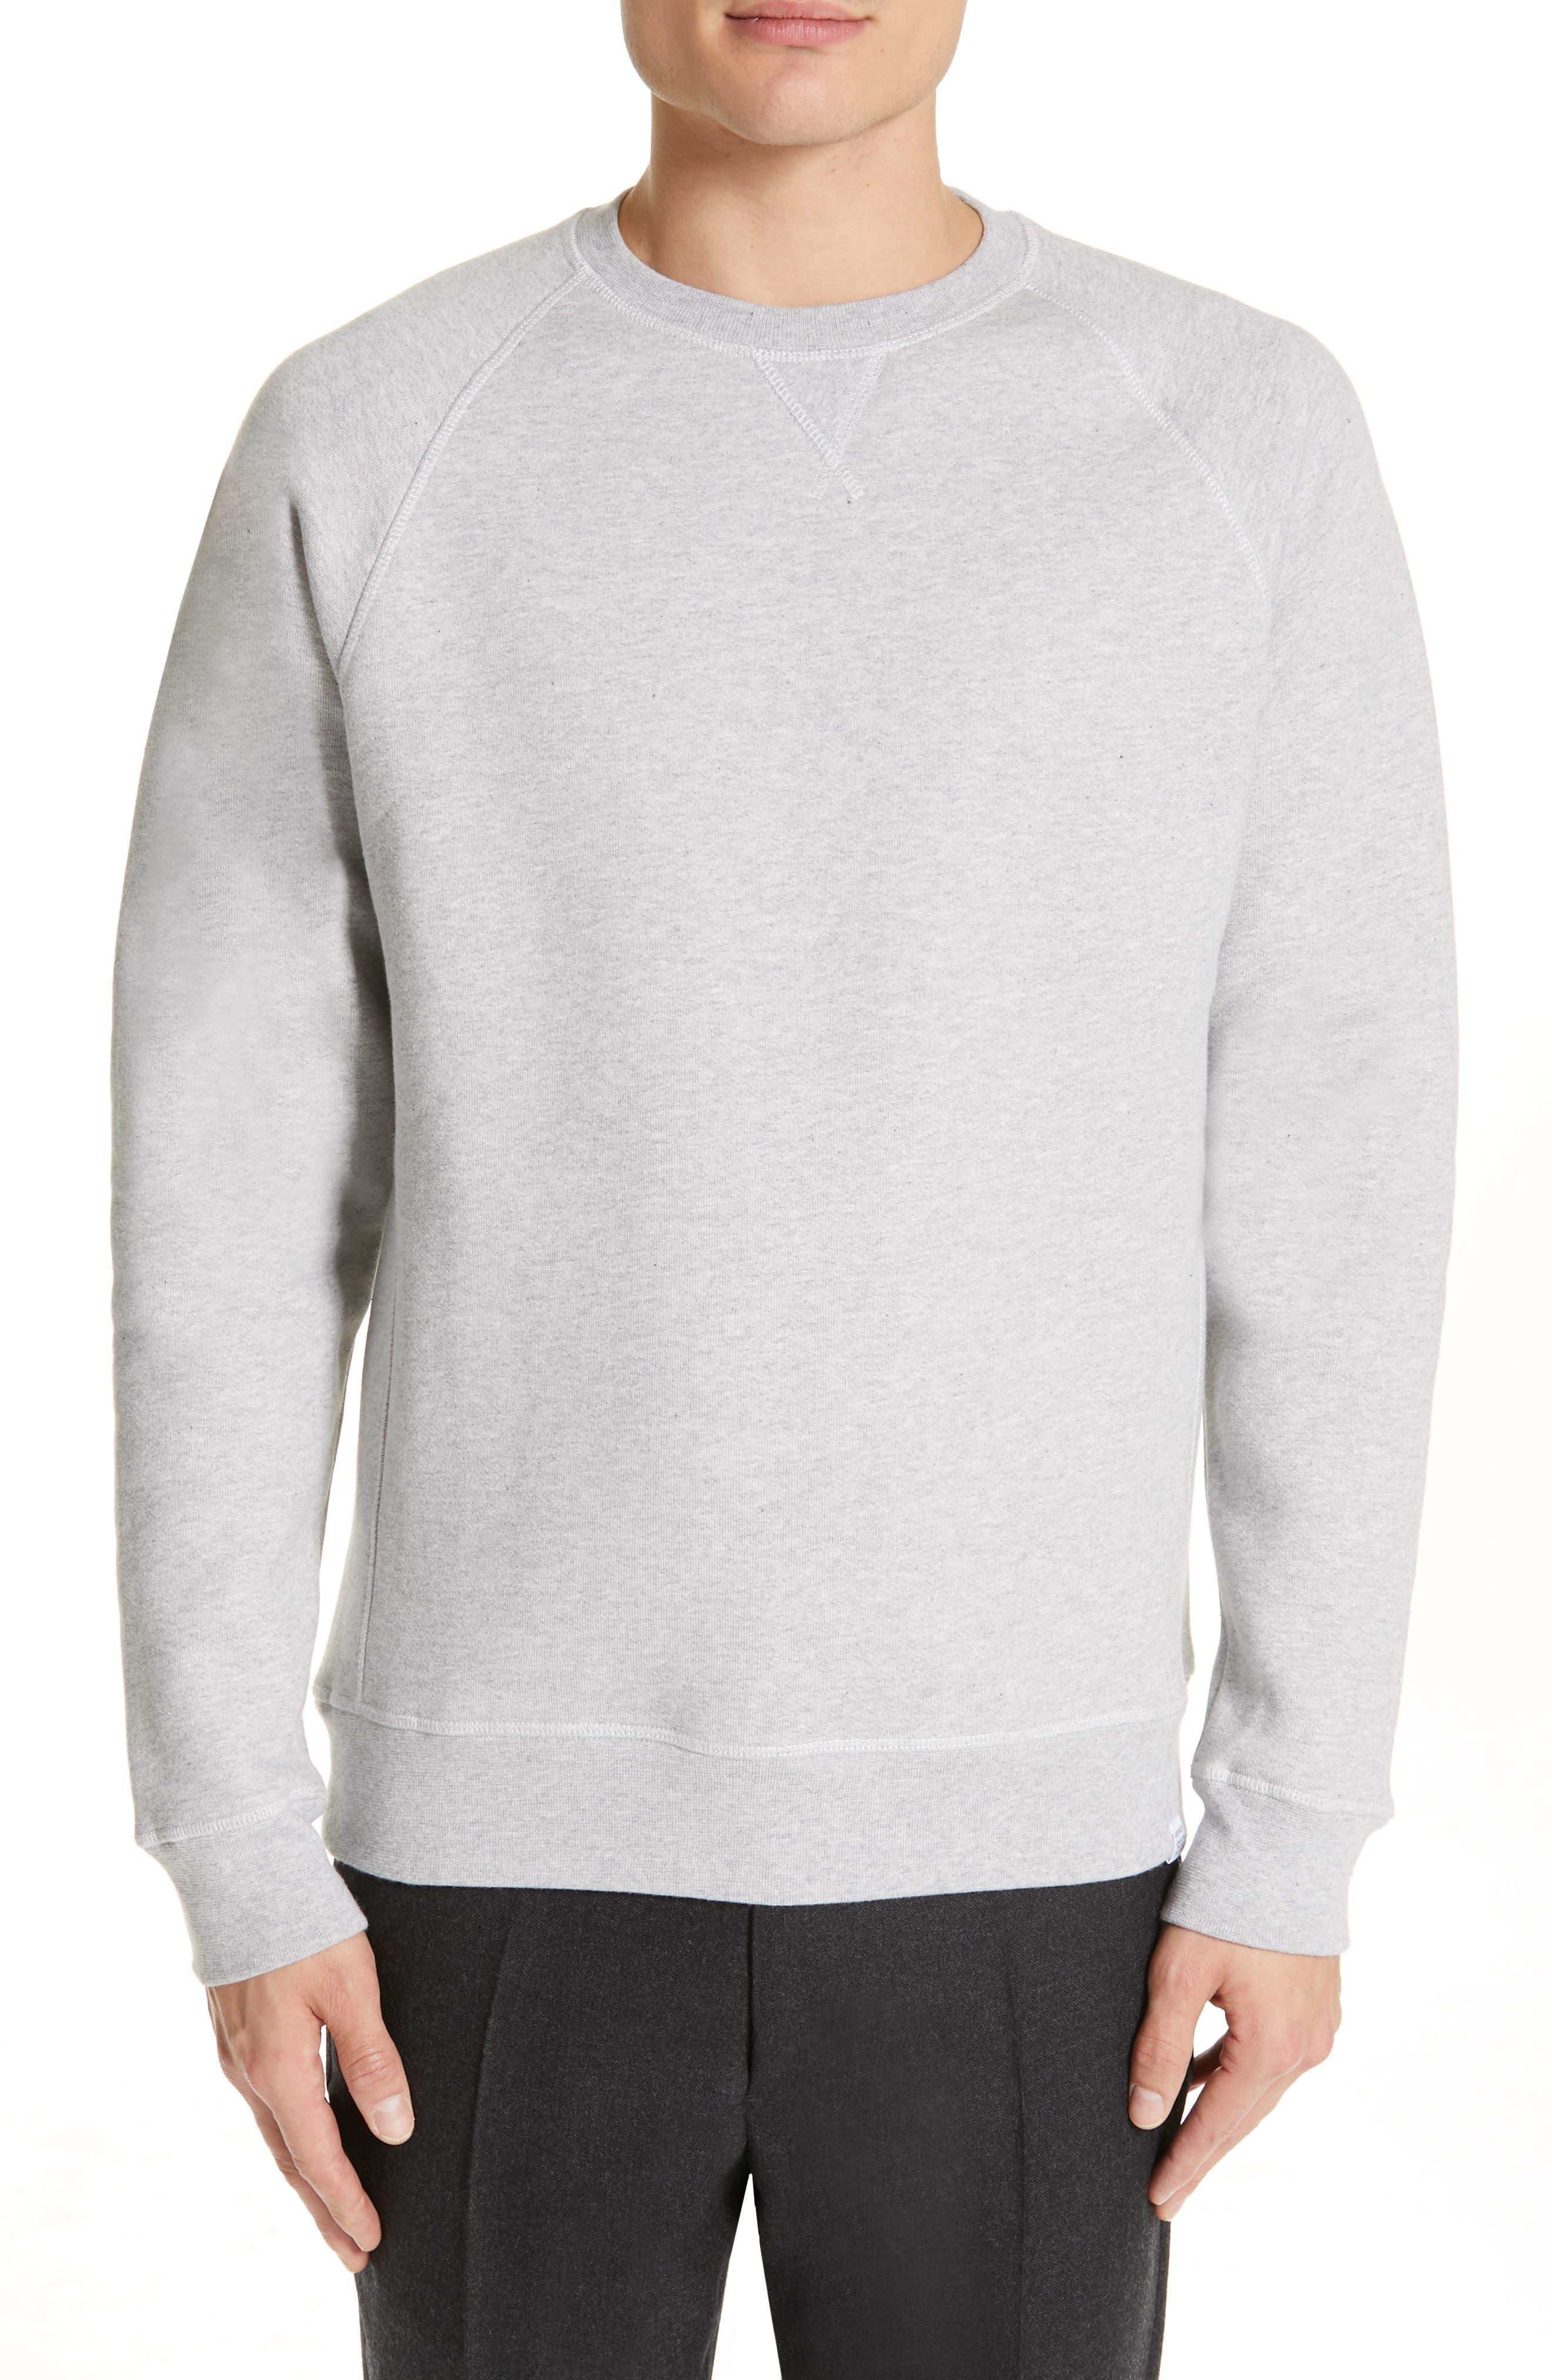 NORSE PROJECTS Ketel Raglan Sweatshirt, Main, color, LIGHT GREY MELANGE